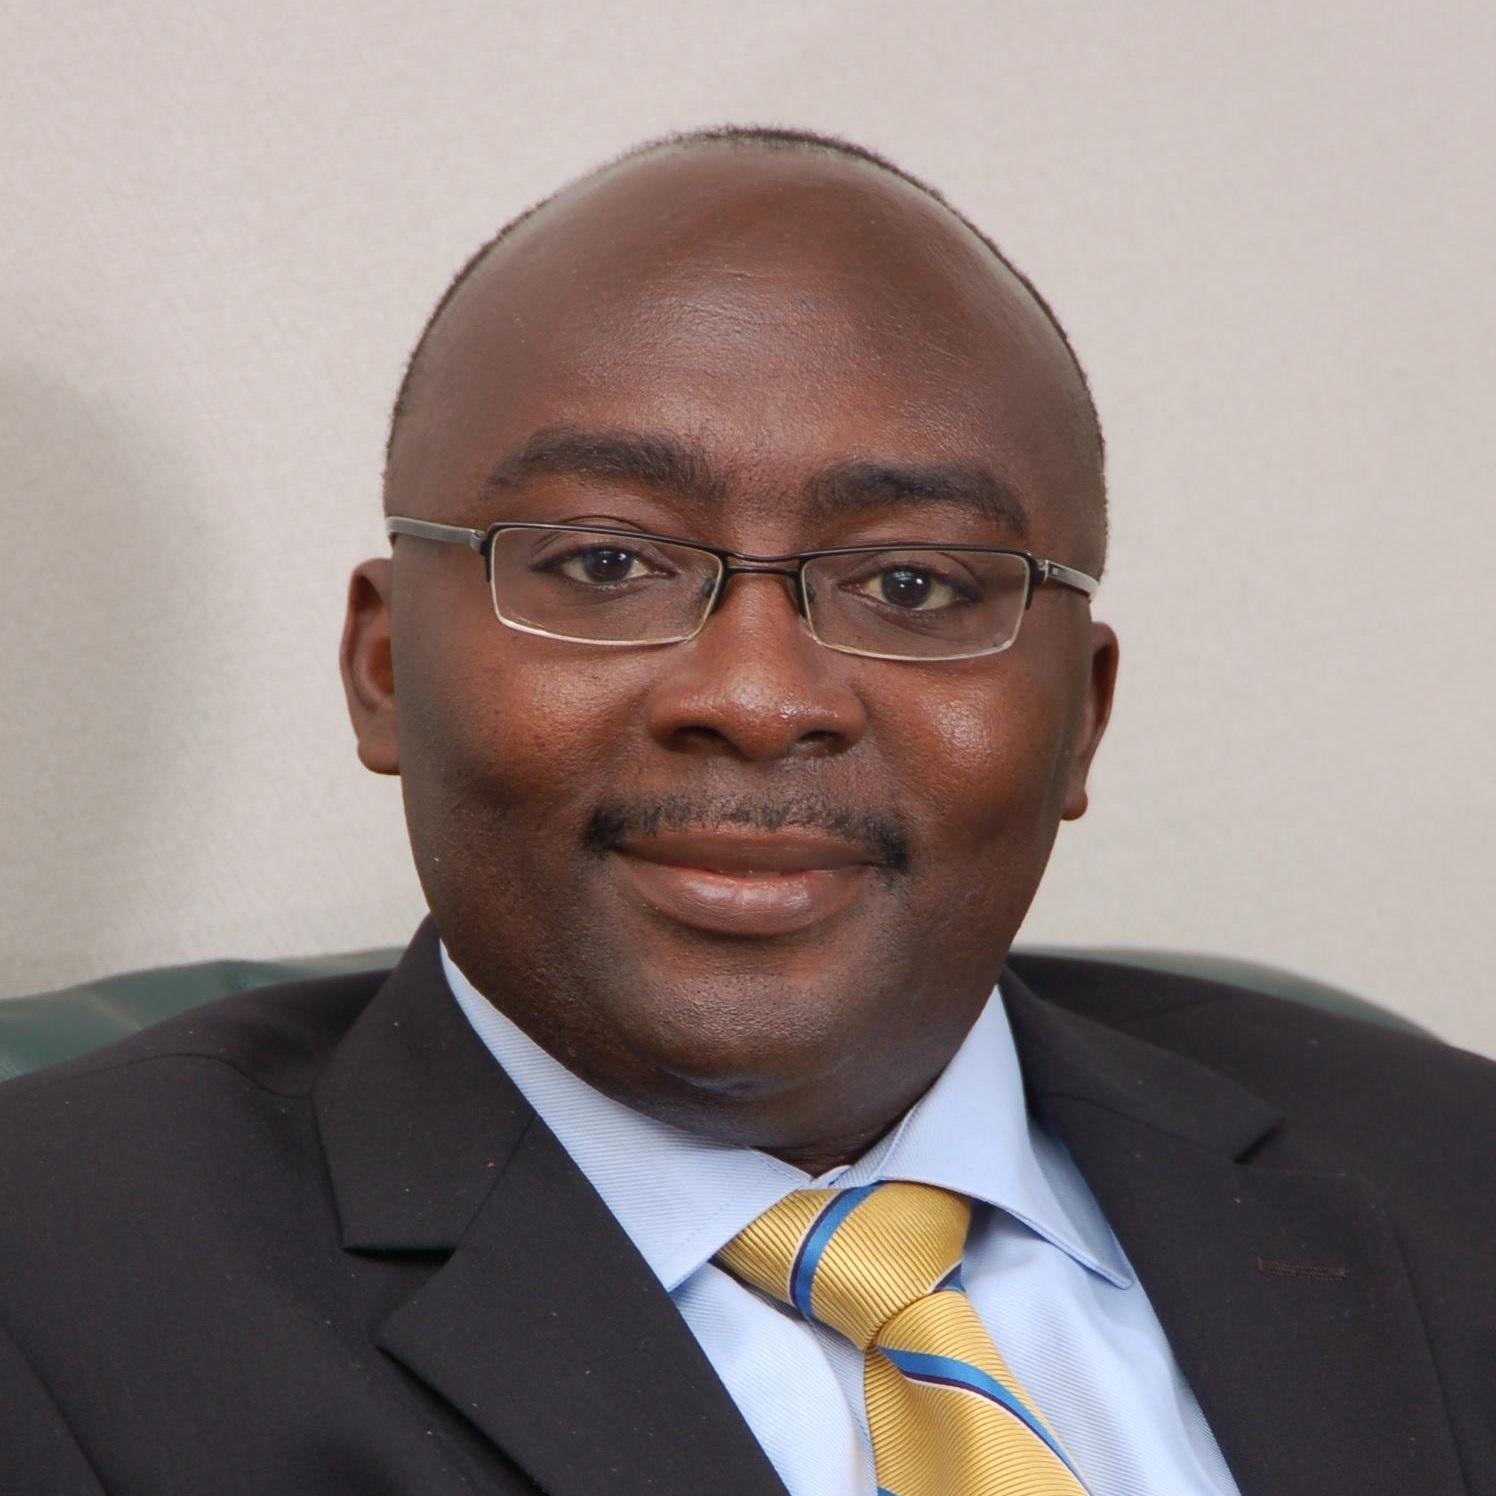 Bawumia wants to abandon post over slight –Koku reveals